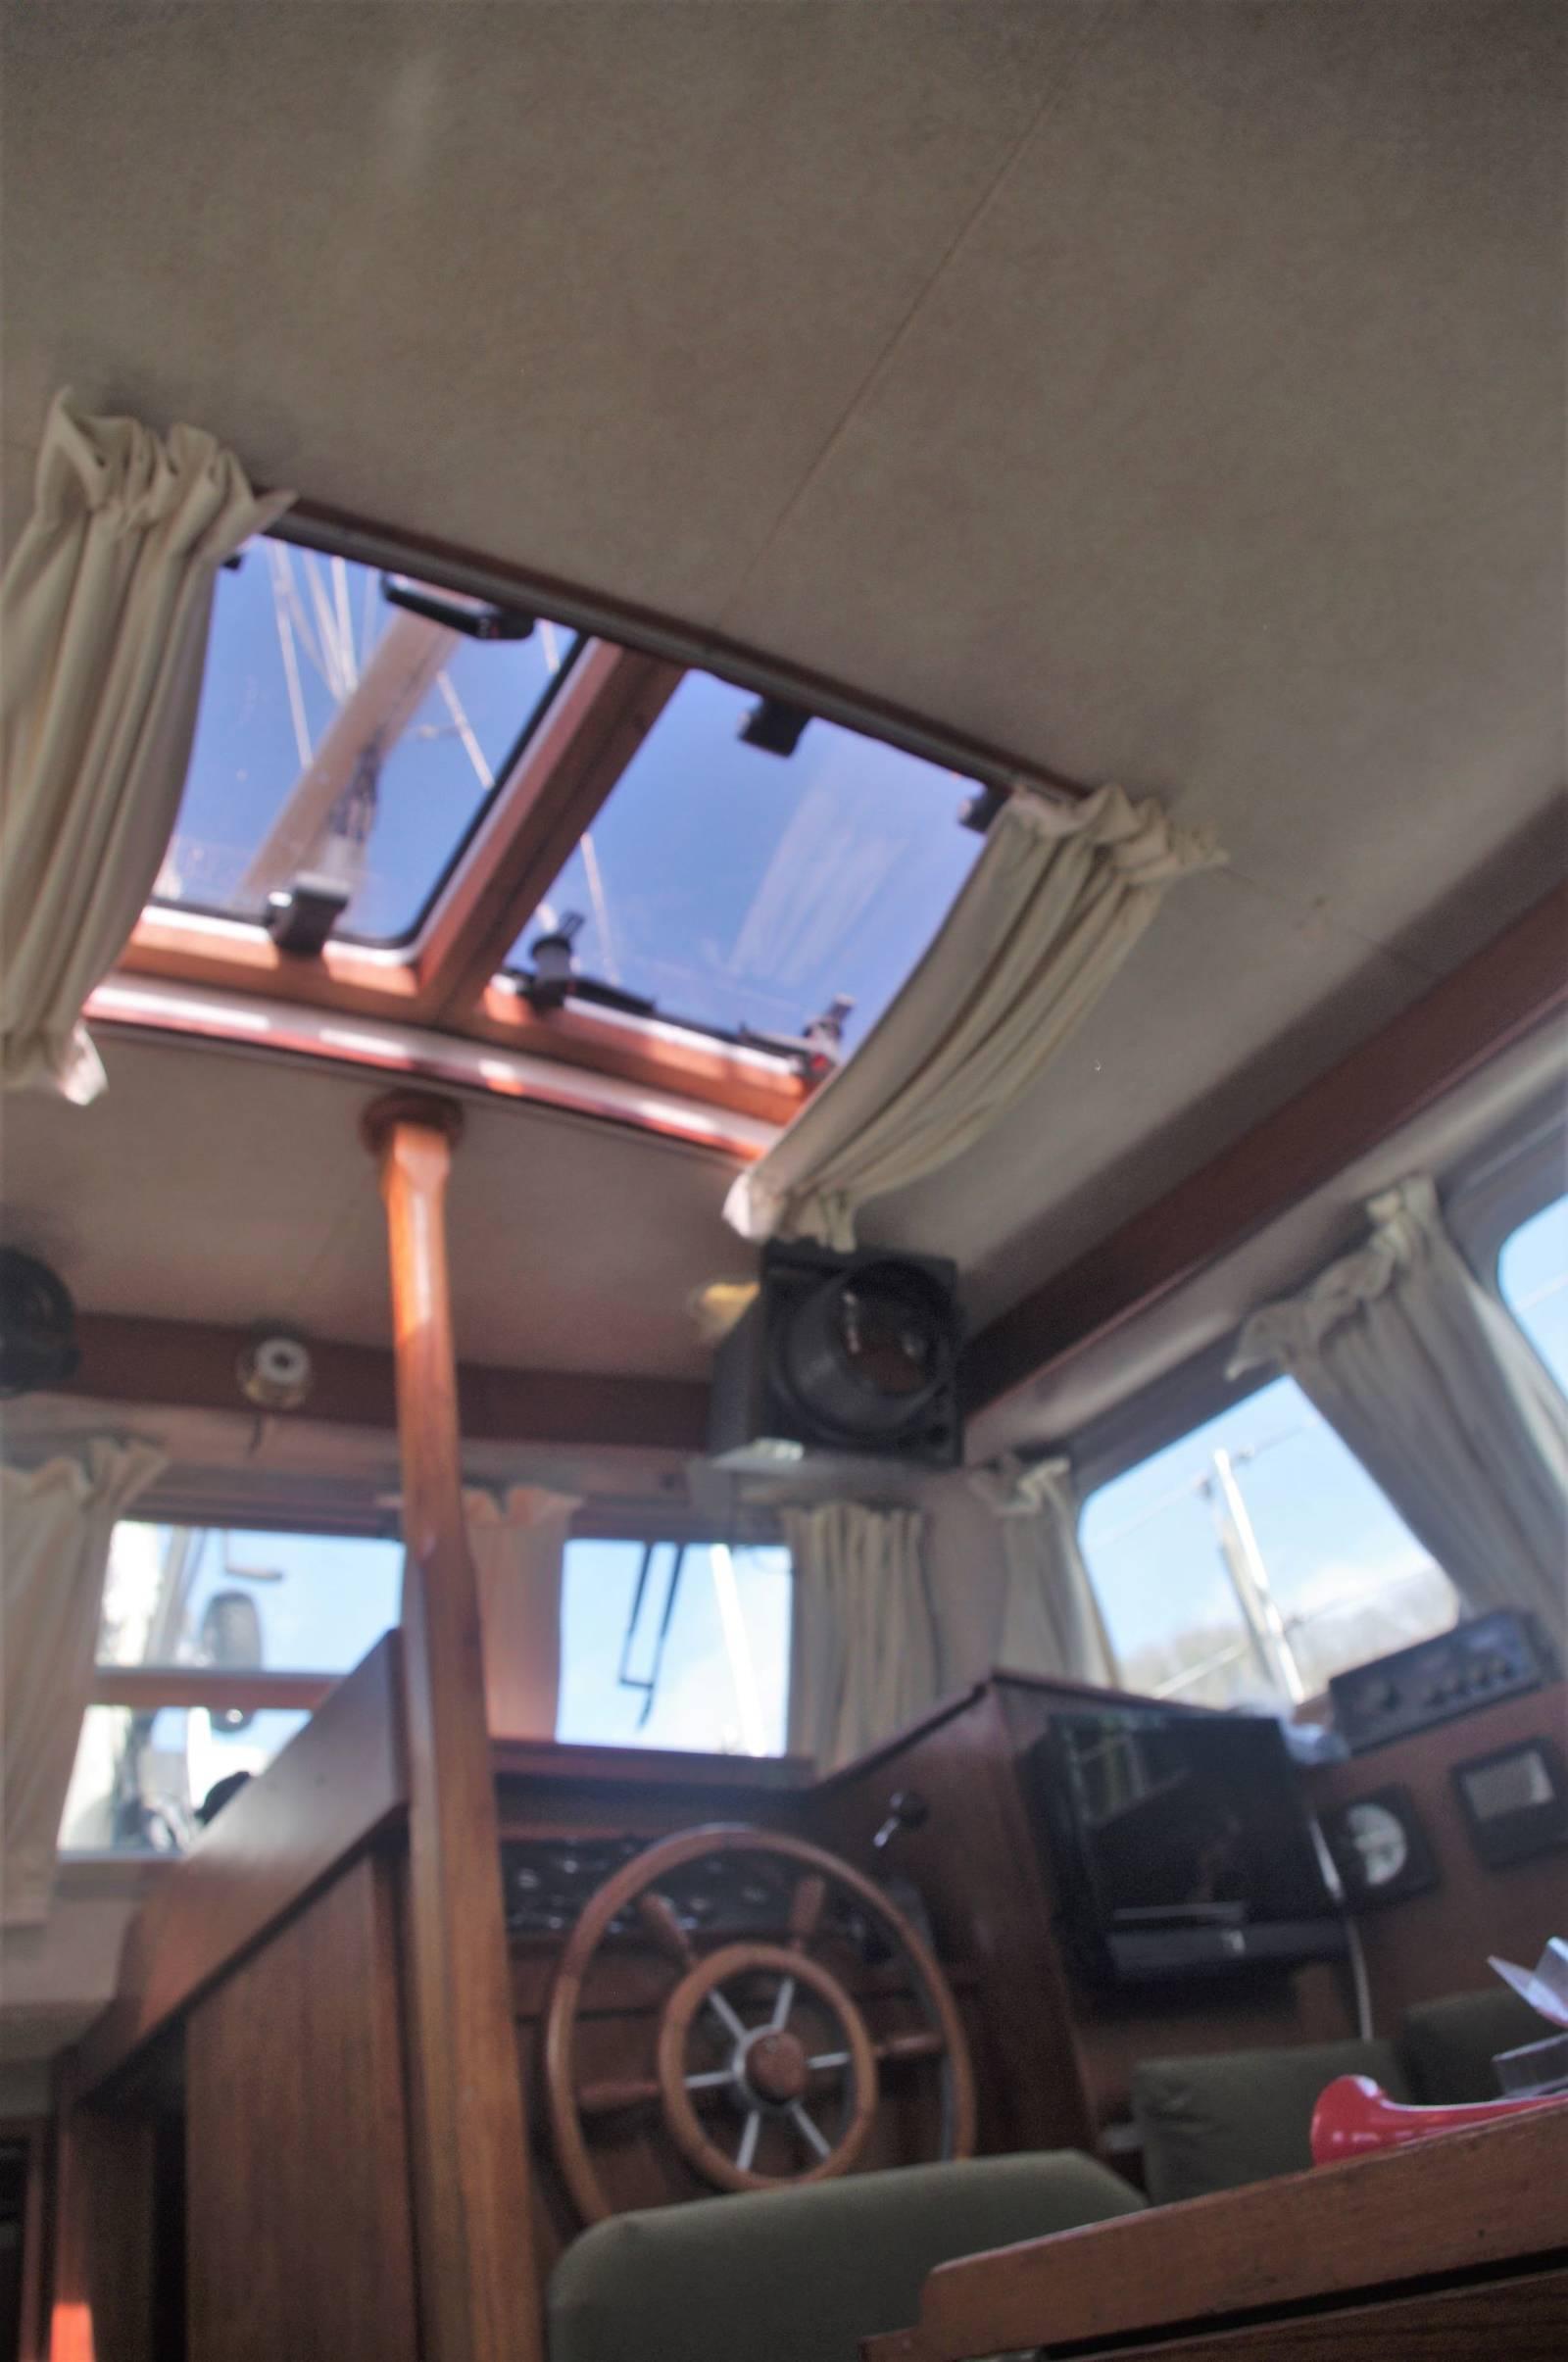 Seastream 34 Ketch For 1980 Sale. Yachts.co Neyland. Tel 01646 602 500